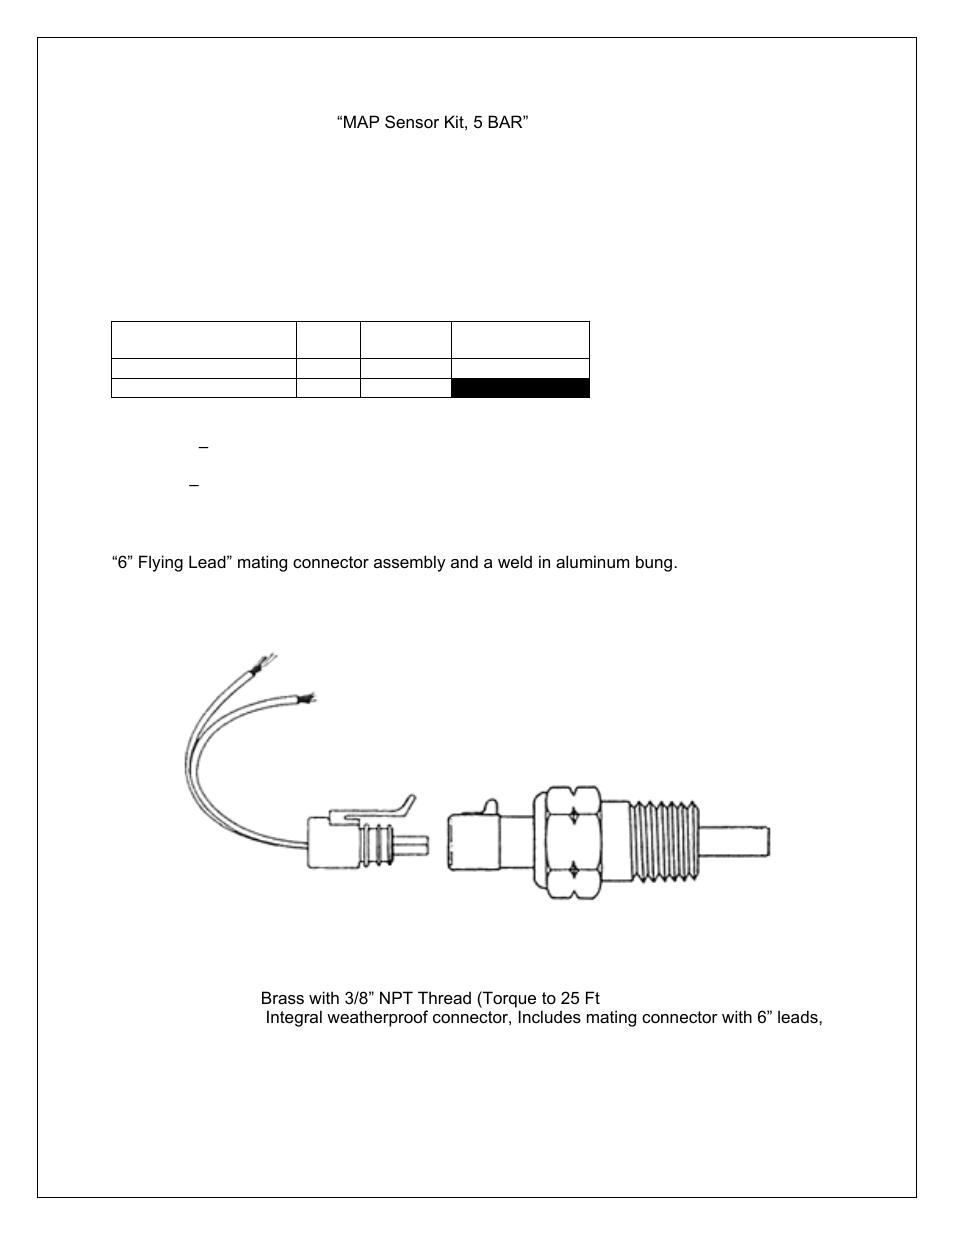 air temp sensor | aem 30-6905 universal programmable ems-4 user manual |  page 27 / 279